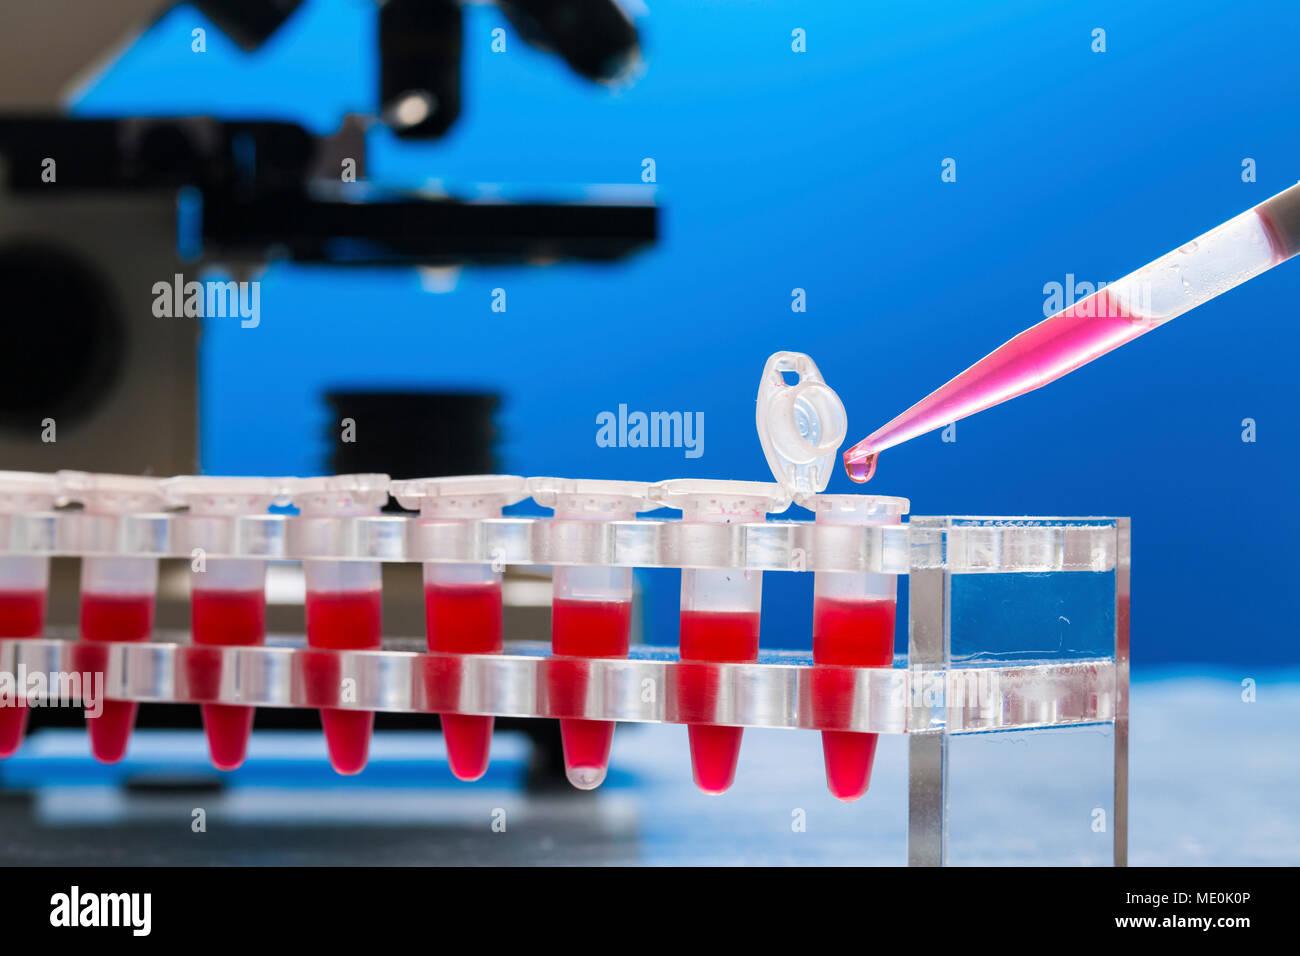 Identification of pathogenic microbes and viruses. - Stock Image